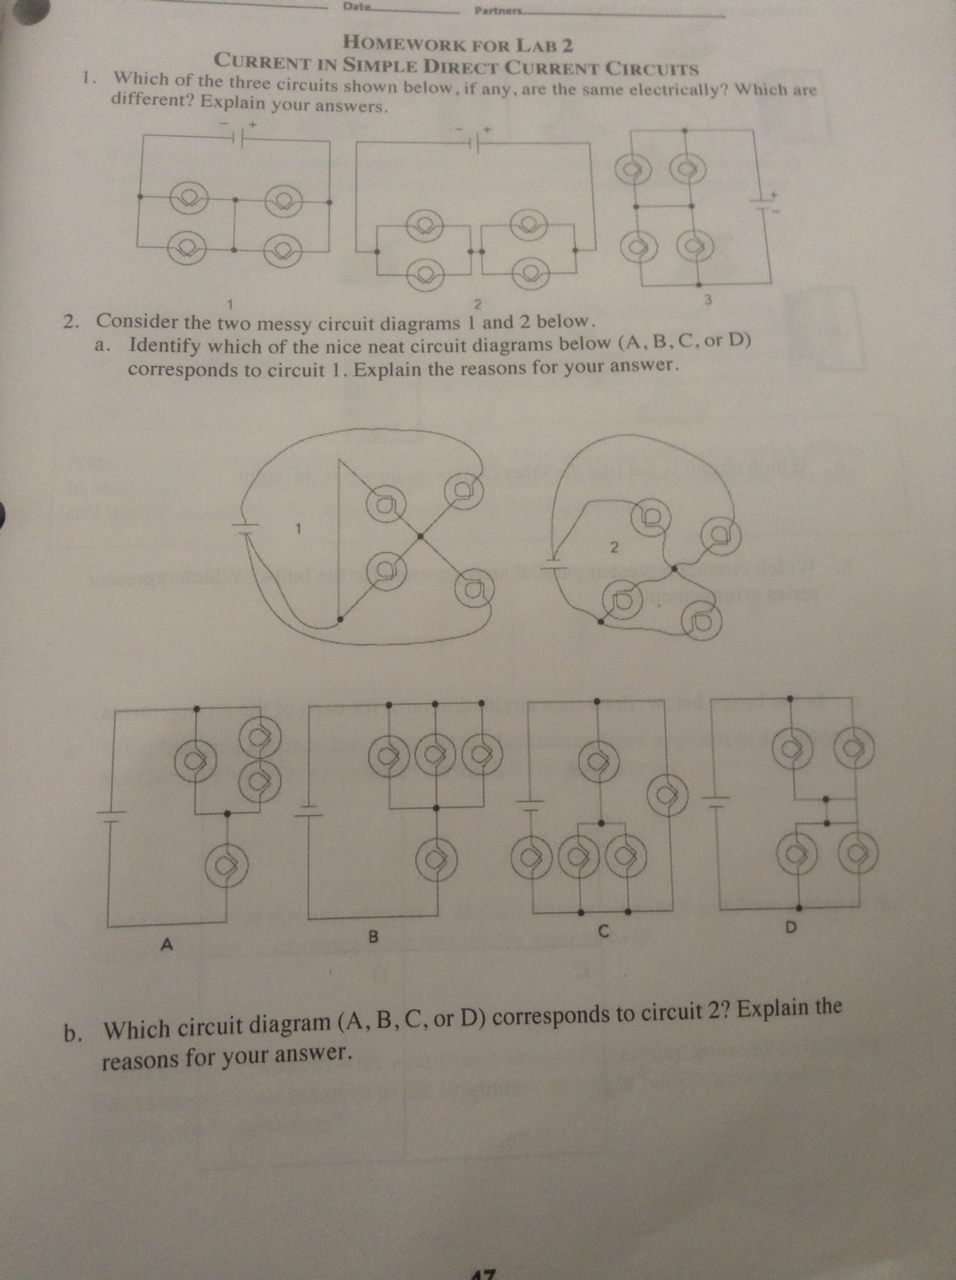 homework for lab 2 current in simple direct curren chegg com Series Circuit Diagrams circuit diagram nice